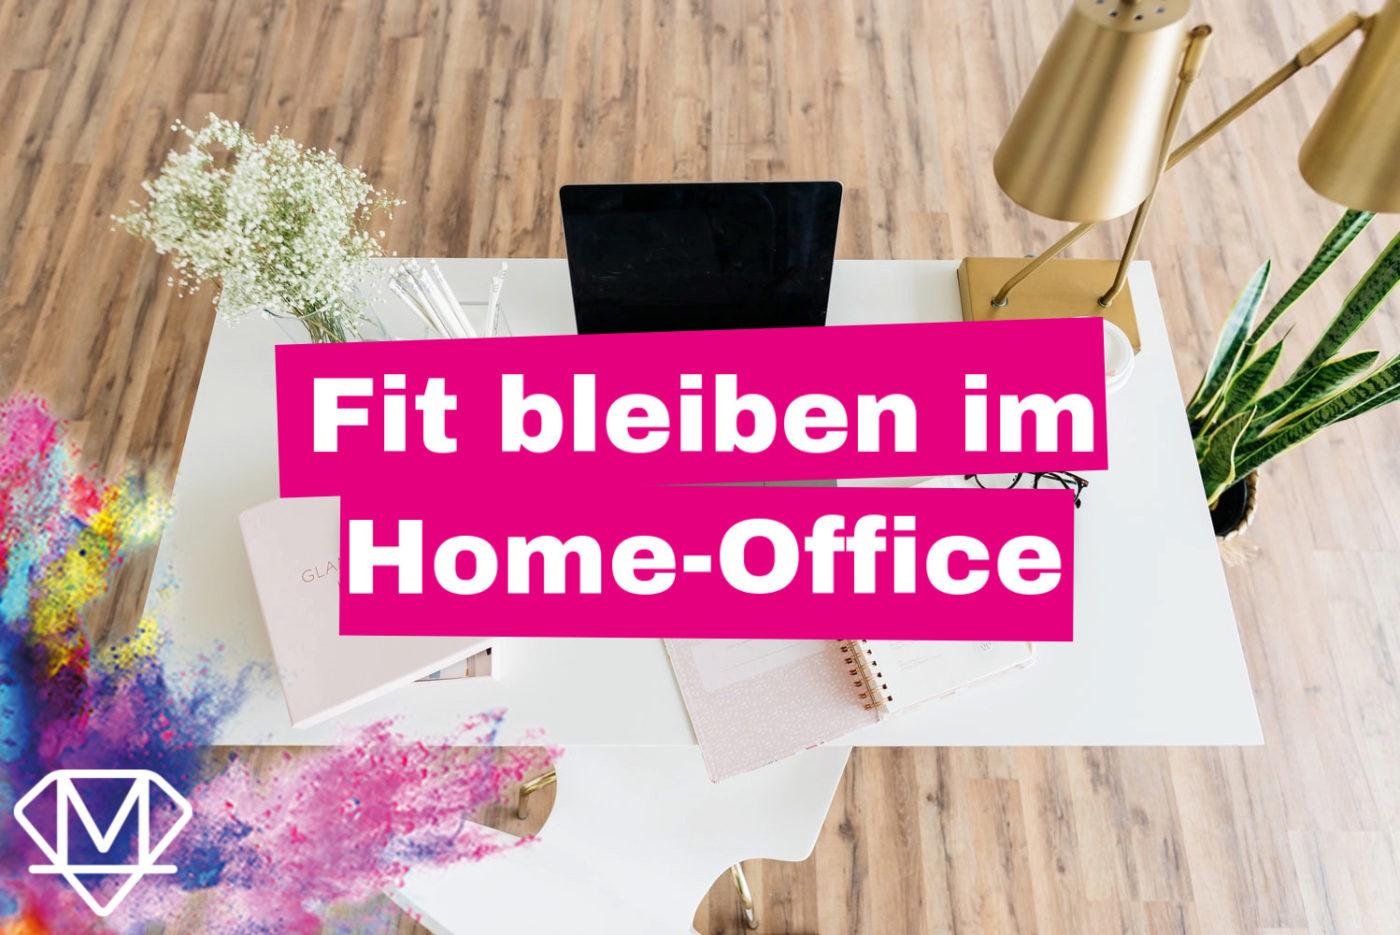 Fit im HomeOffice MOVEMENTFITNESS 1400x935 - So bleibst du im Home Office fit!